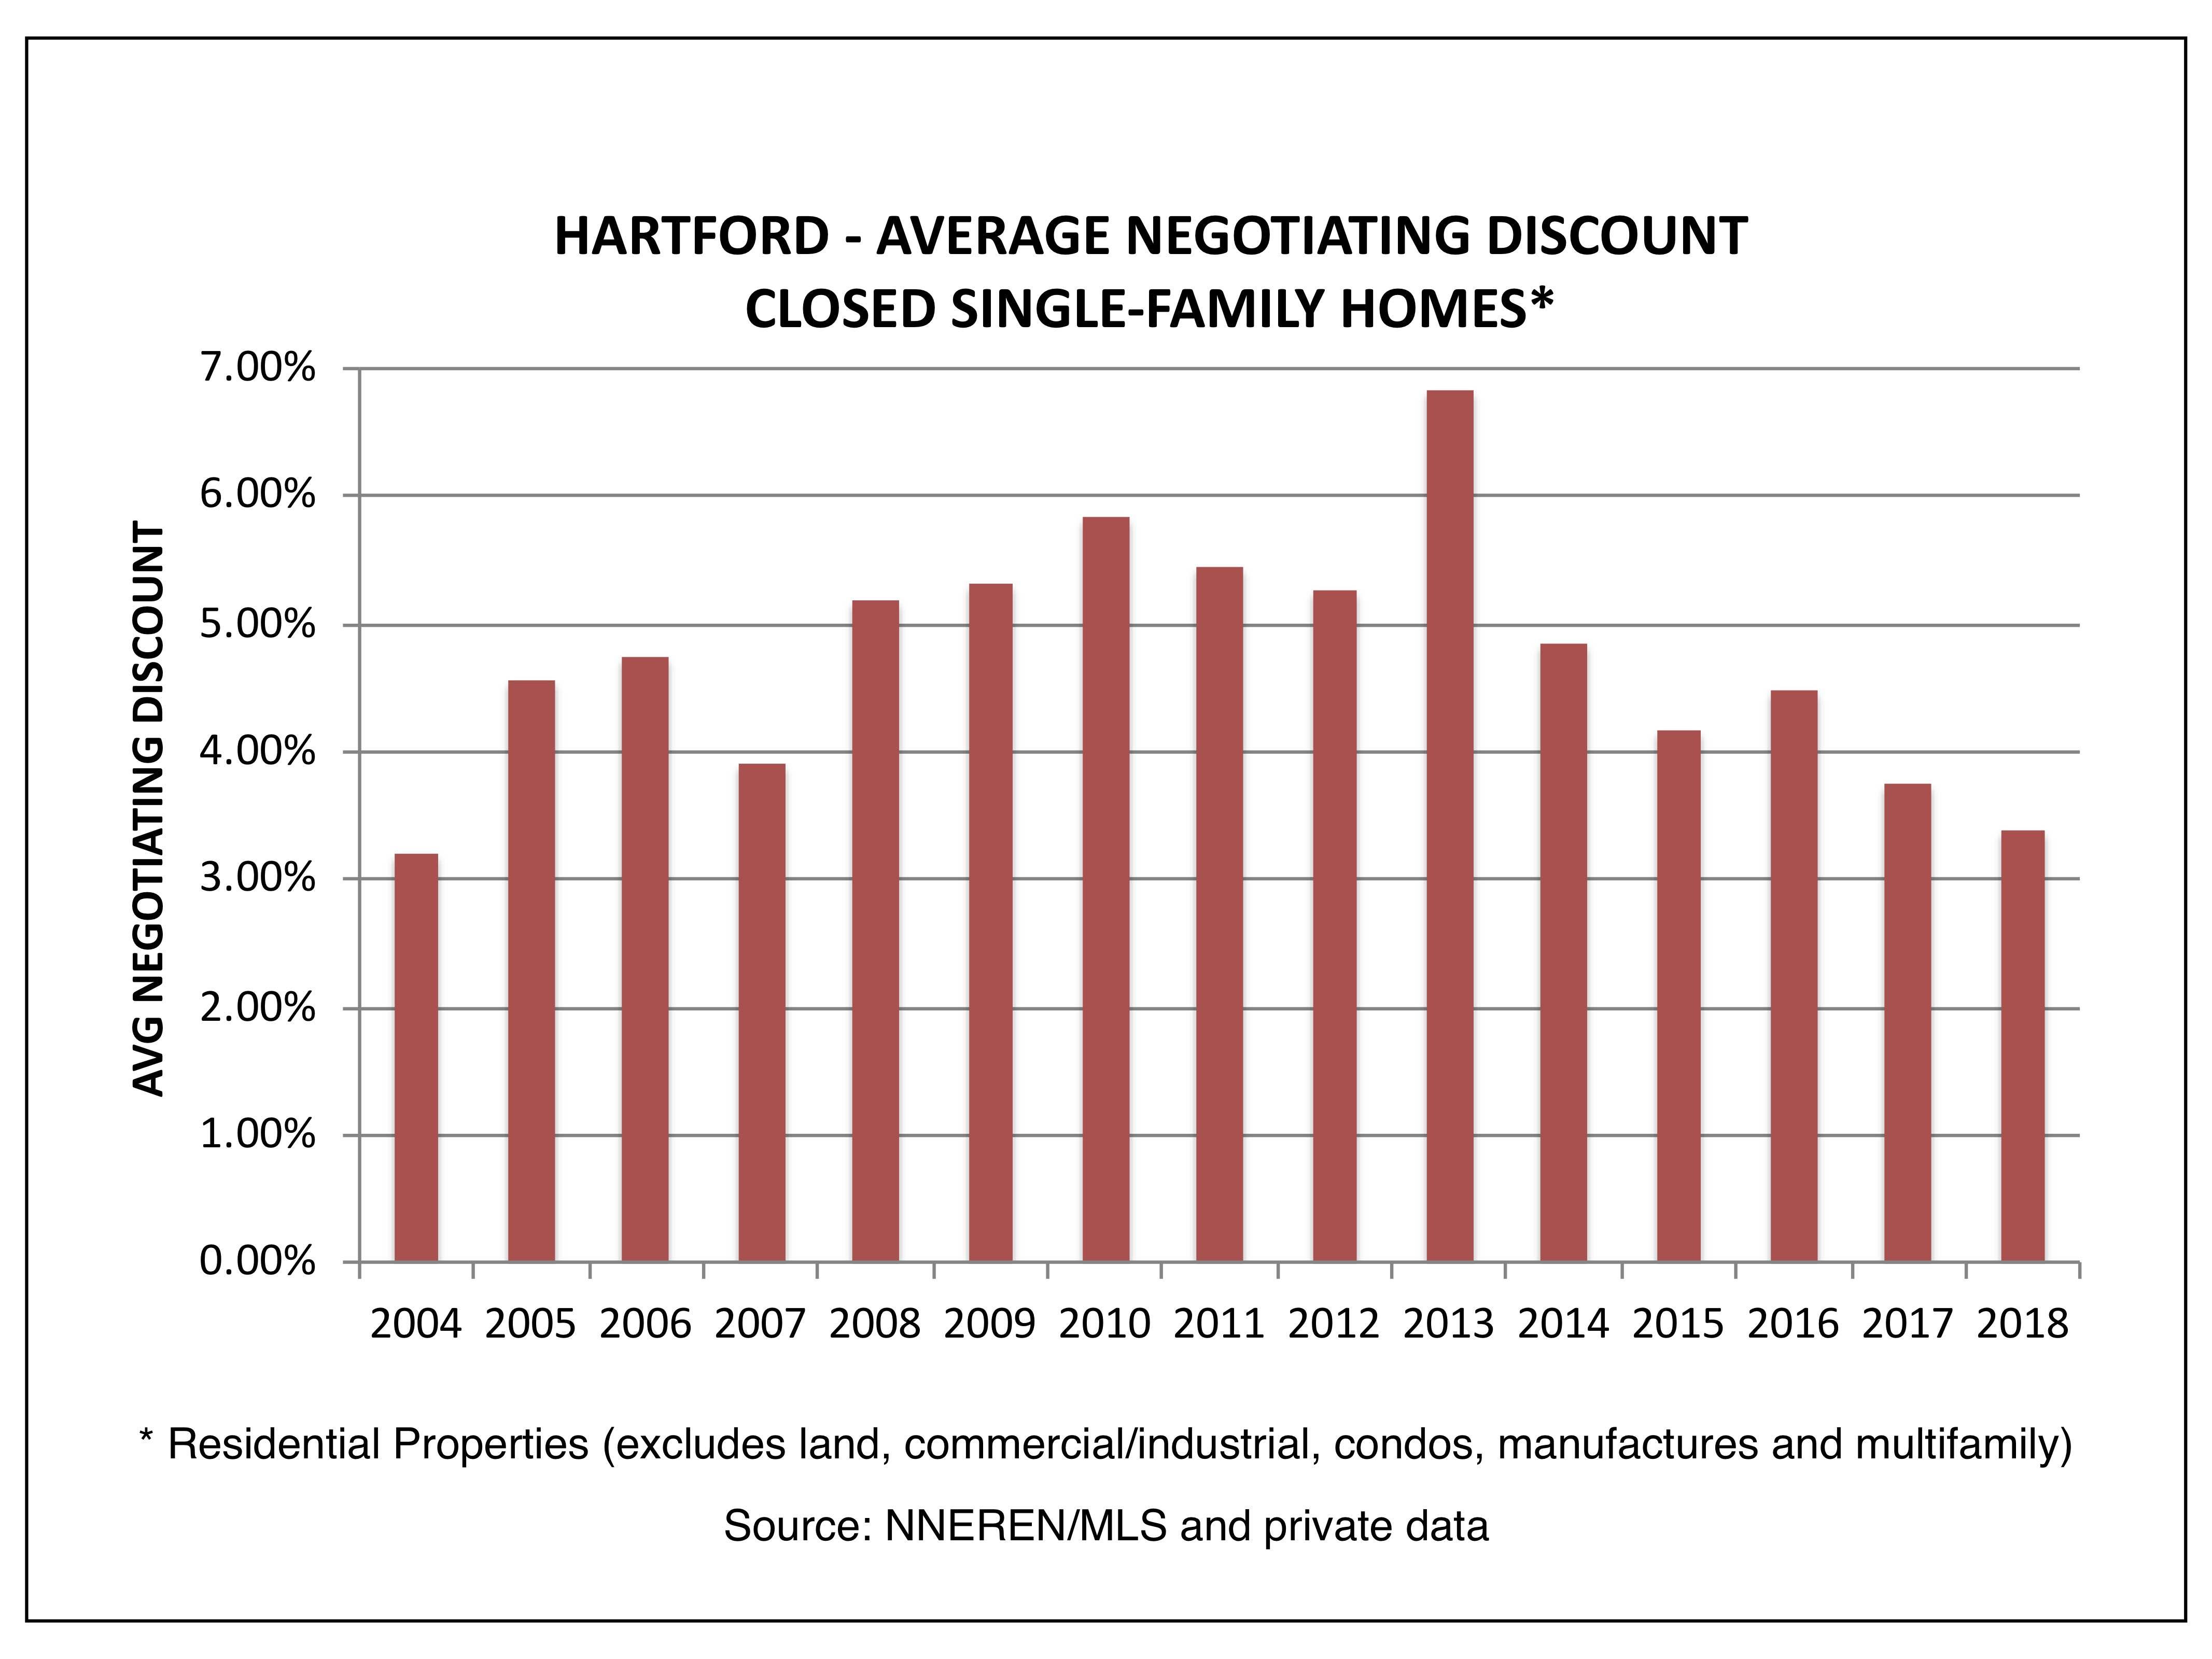 Hartford VT Real Estate - Avg Negotiating Discount